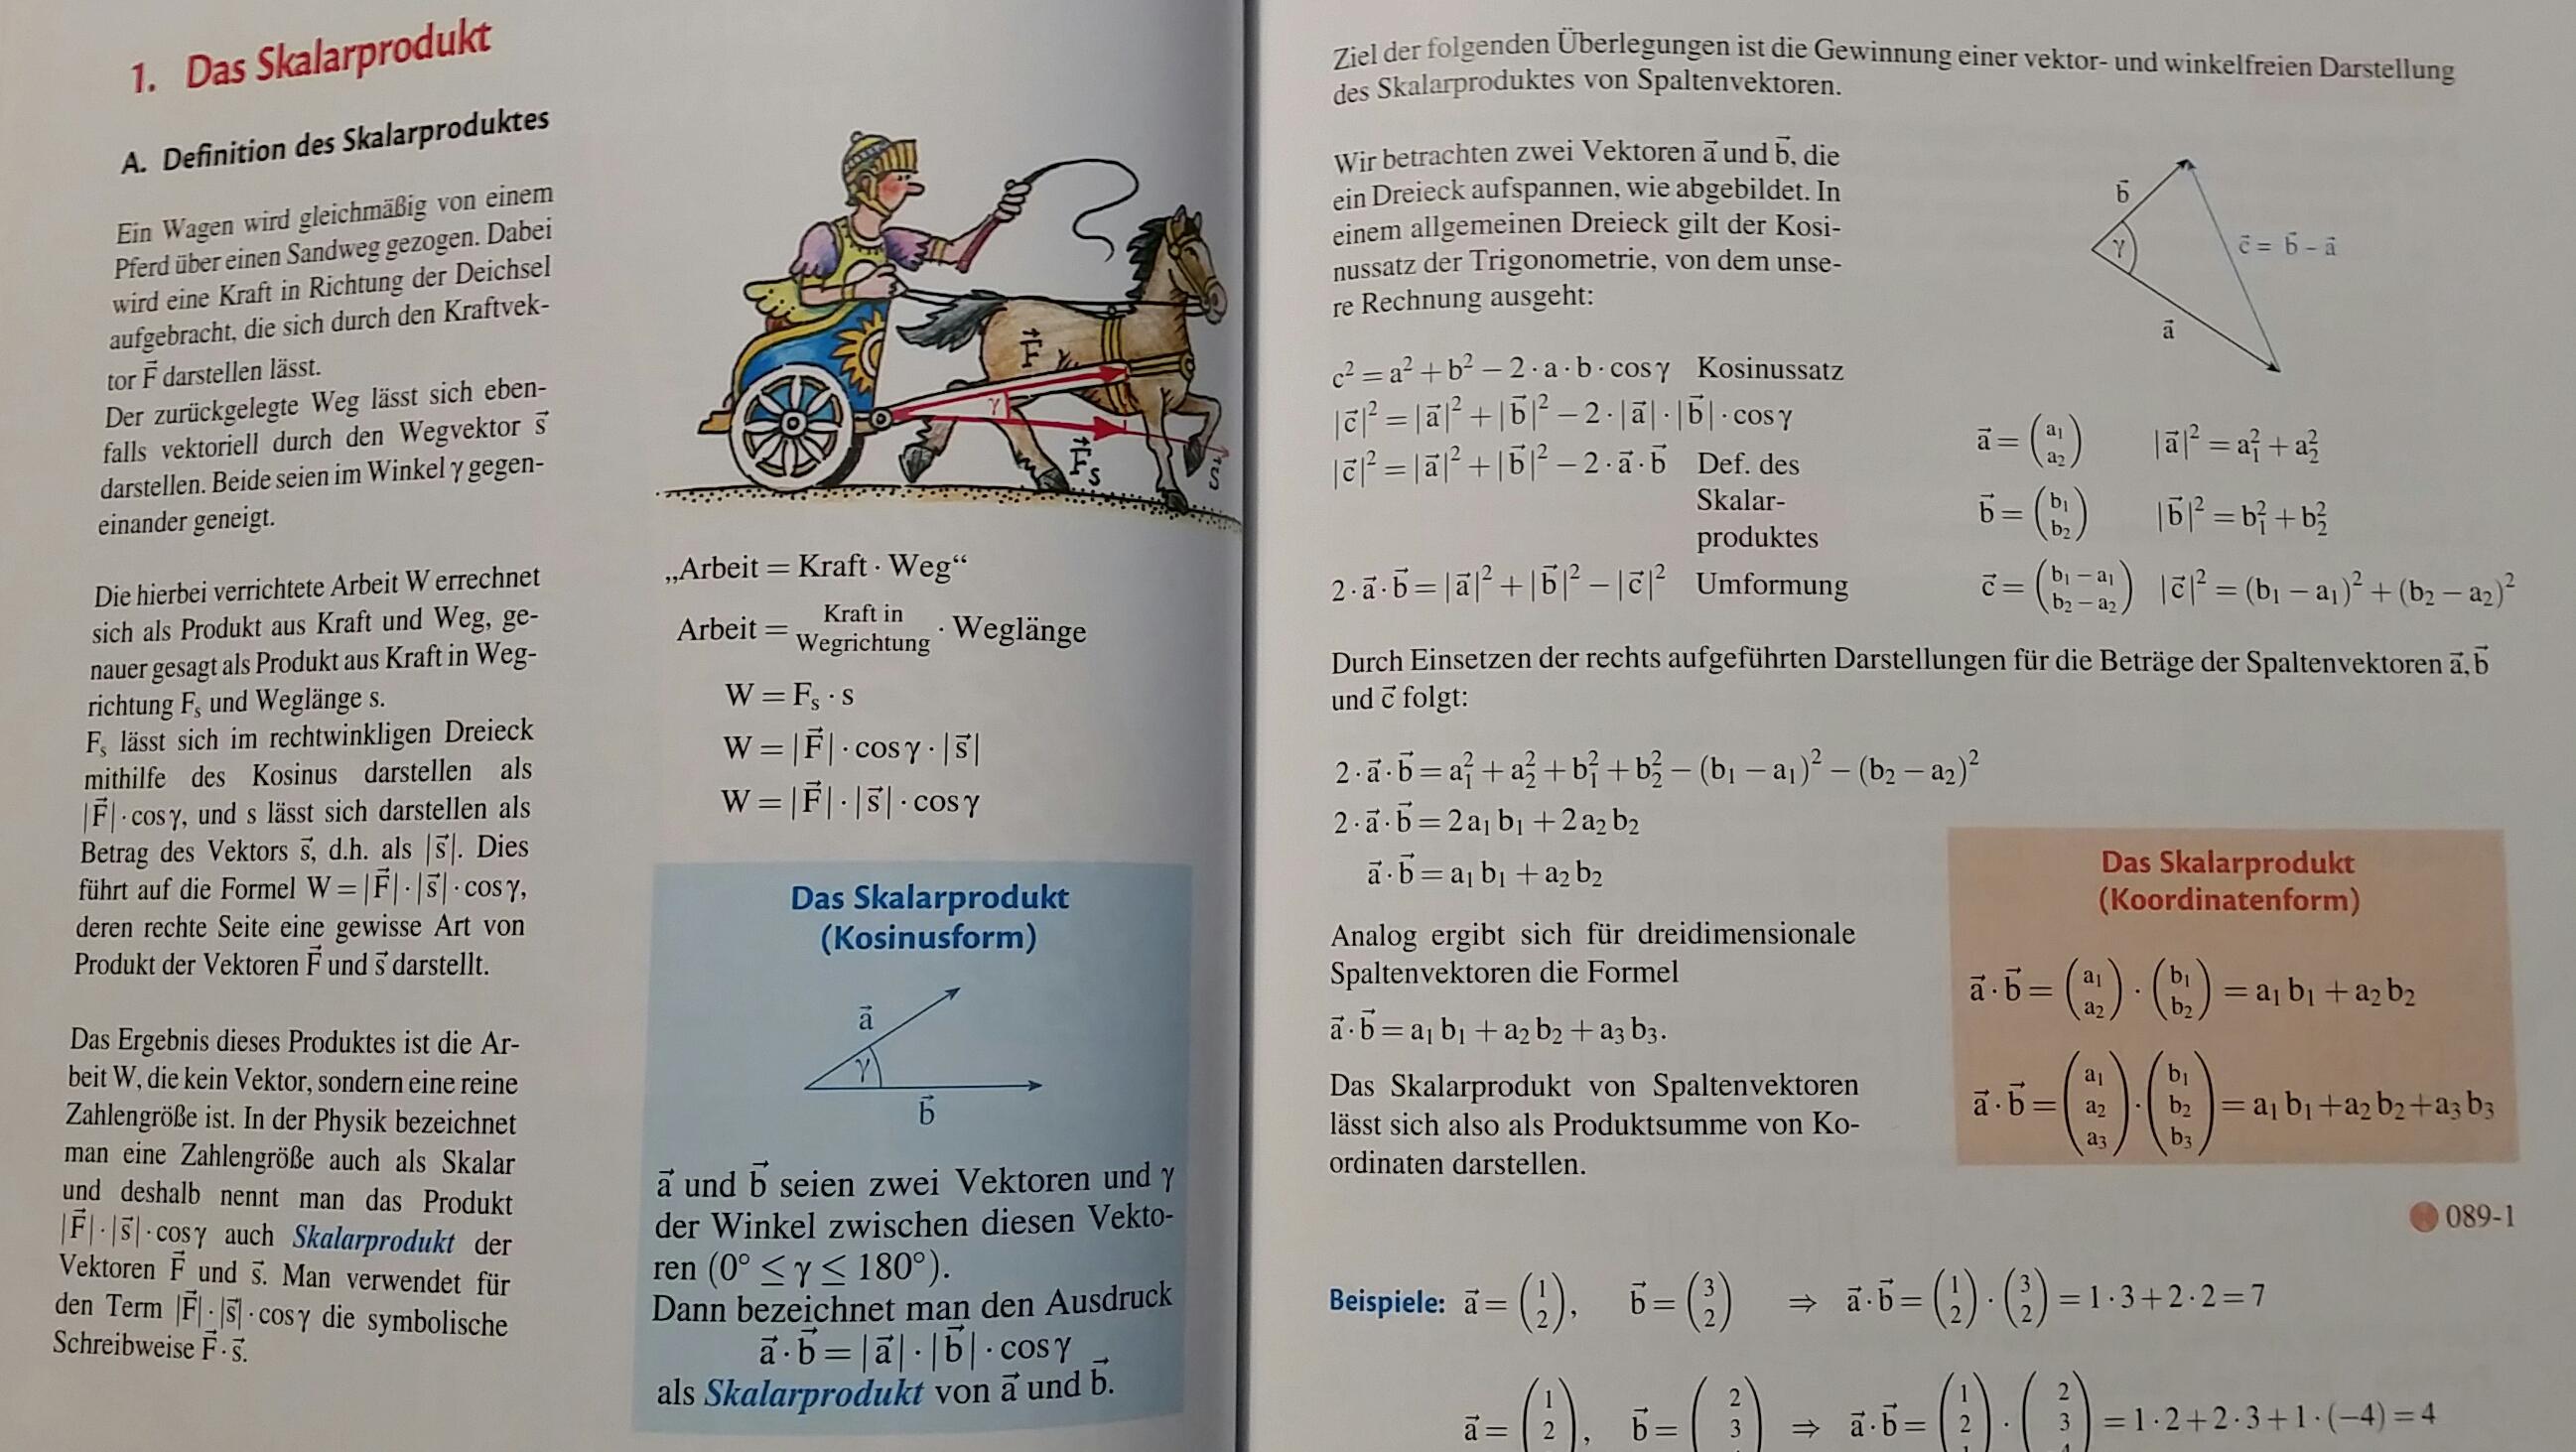 Fein Skalarmultiplikation Von Matrizen Arbeitsblatt Galerie - Super ...